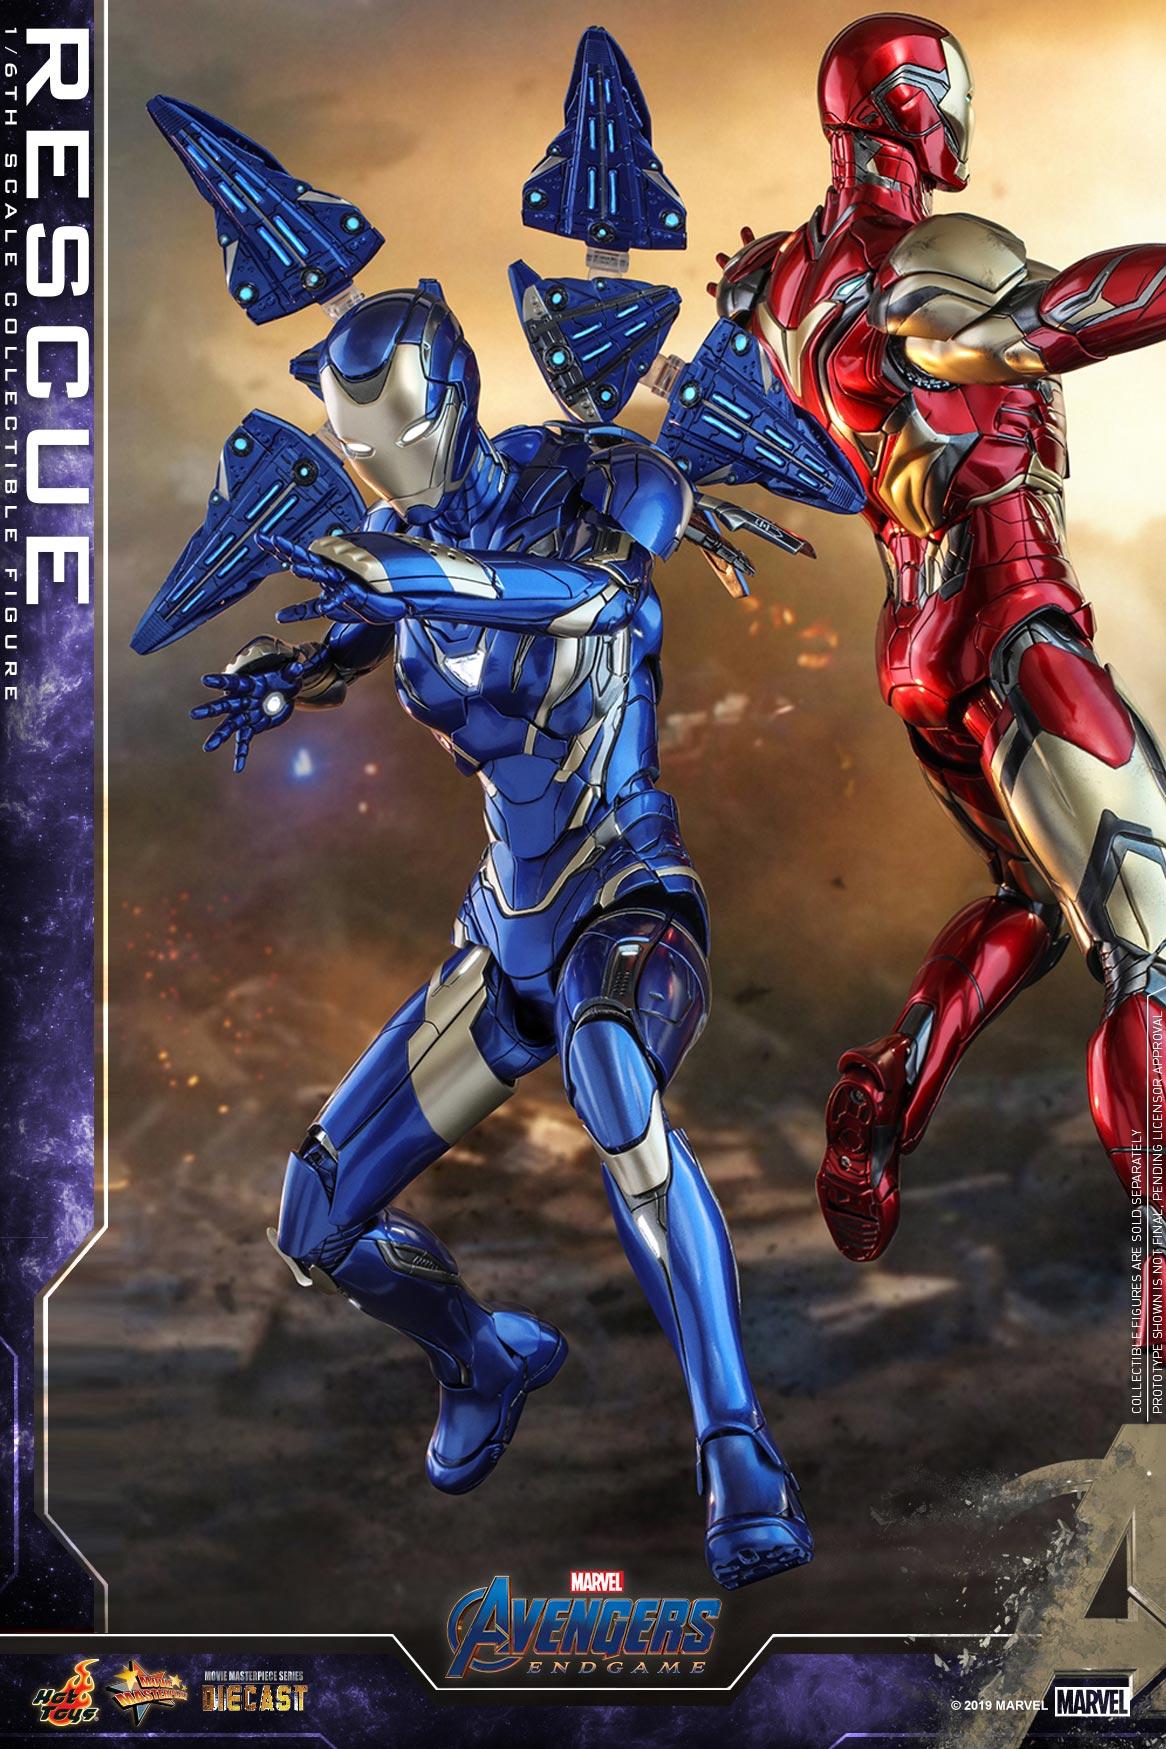 Hot-Toys---Avengers-4---Rescue-collectible-figure_PR7